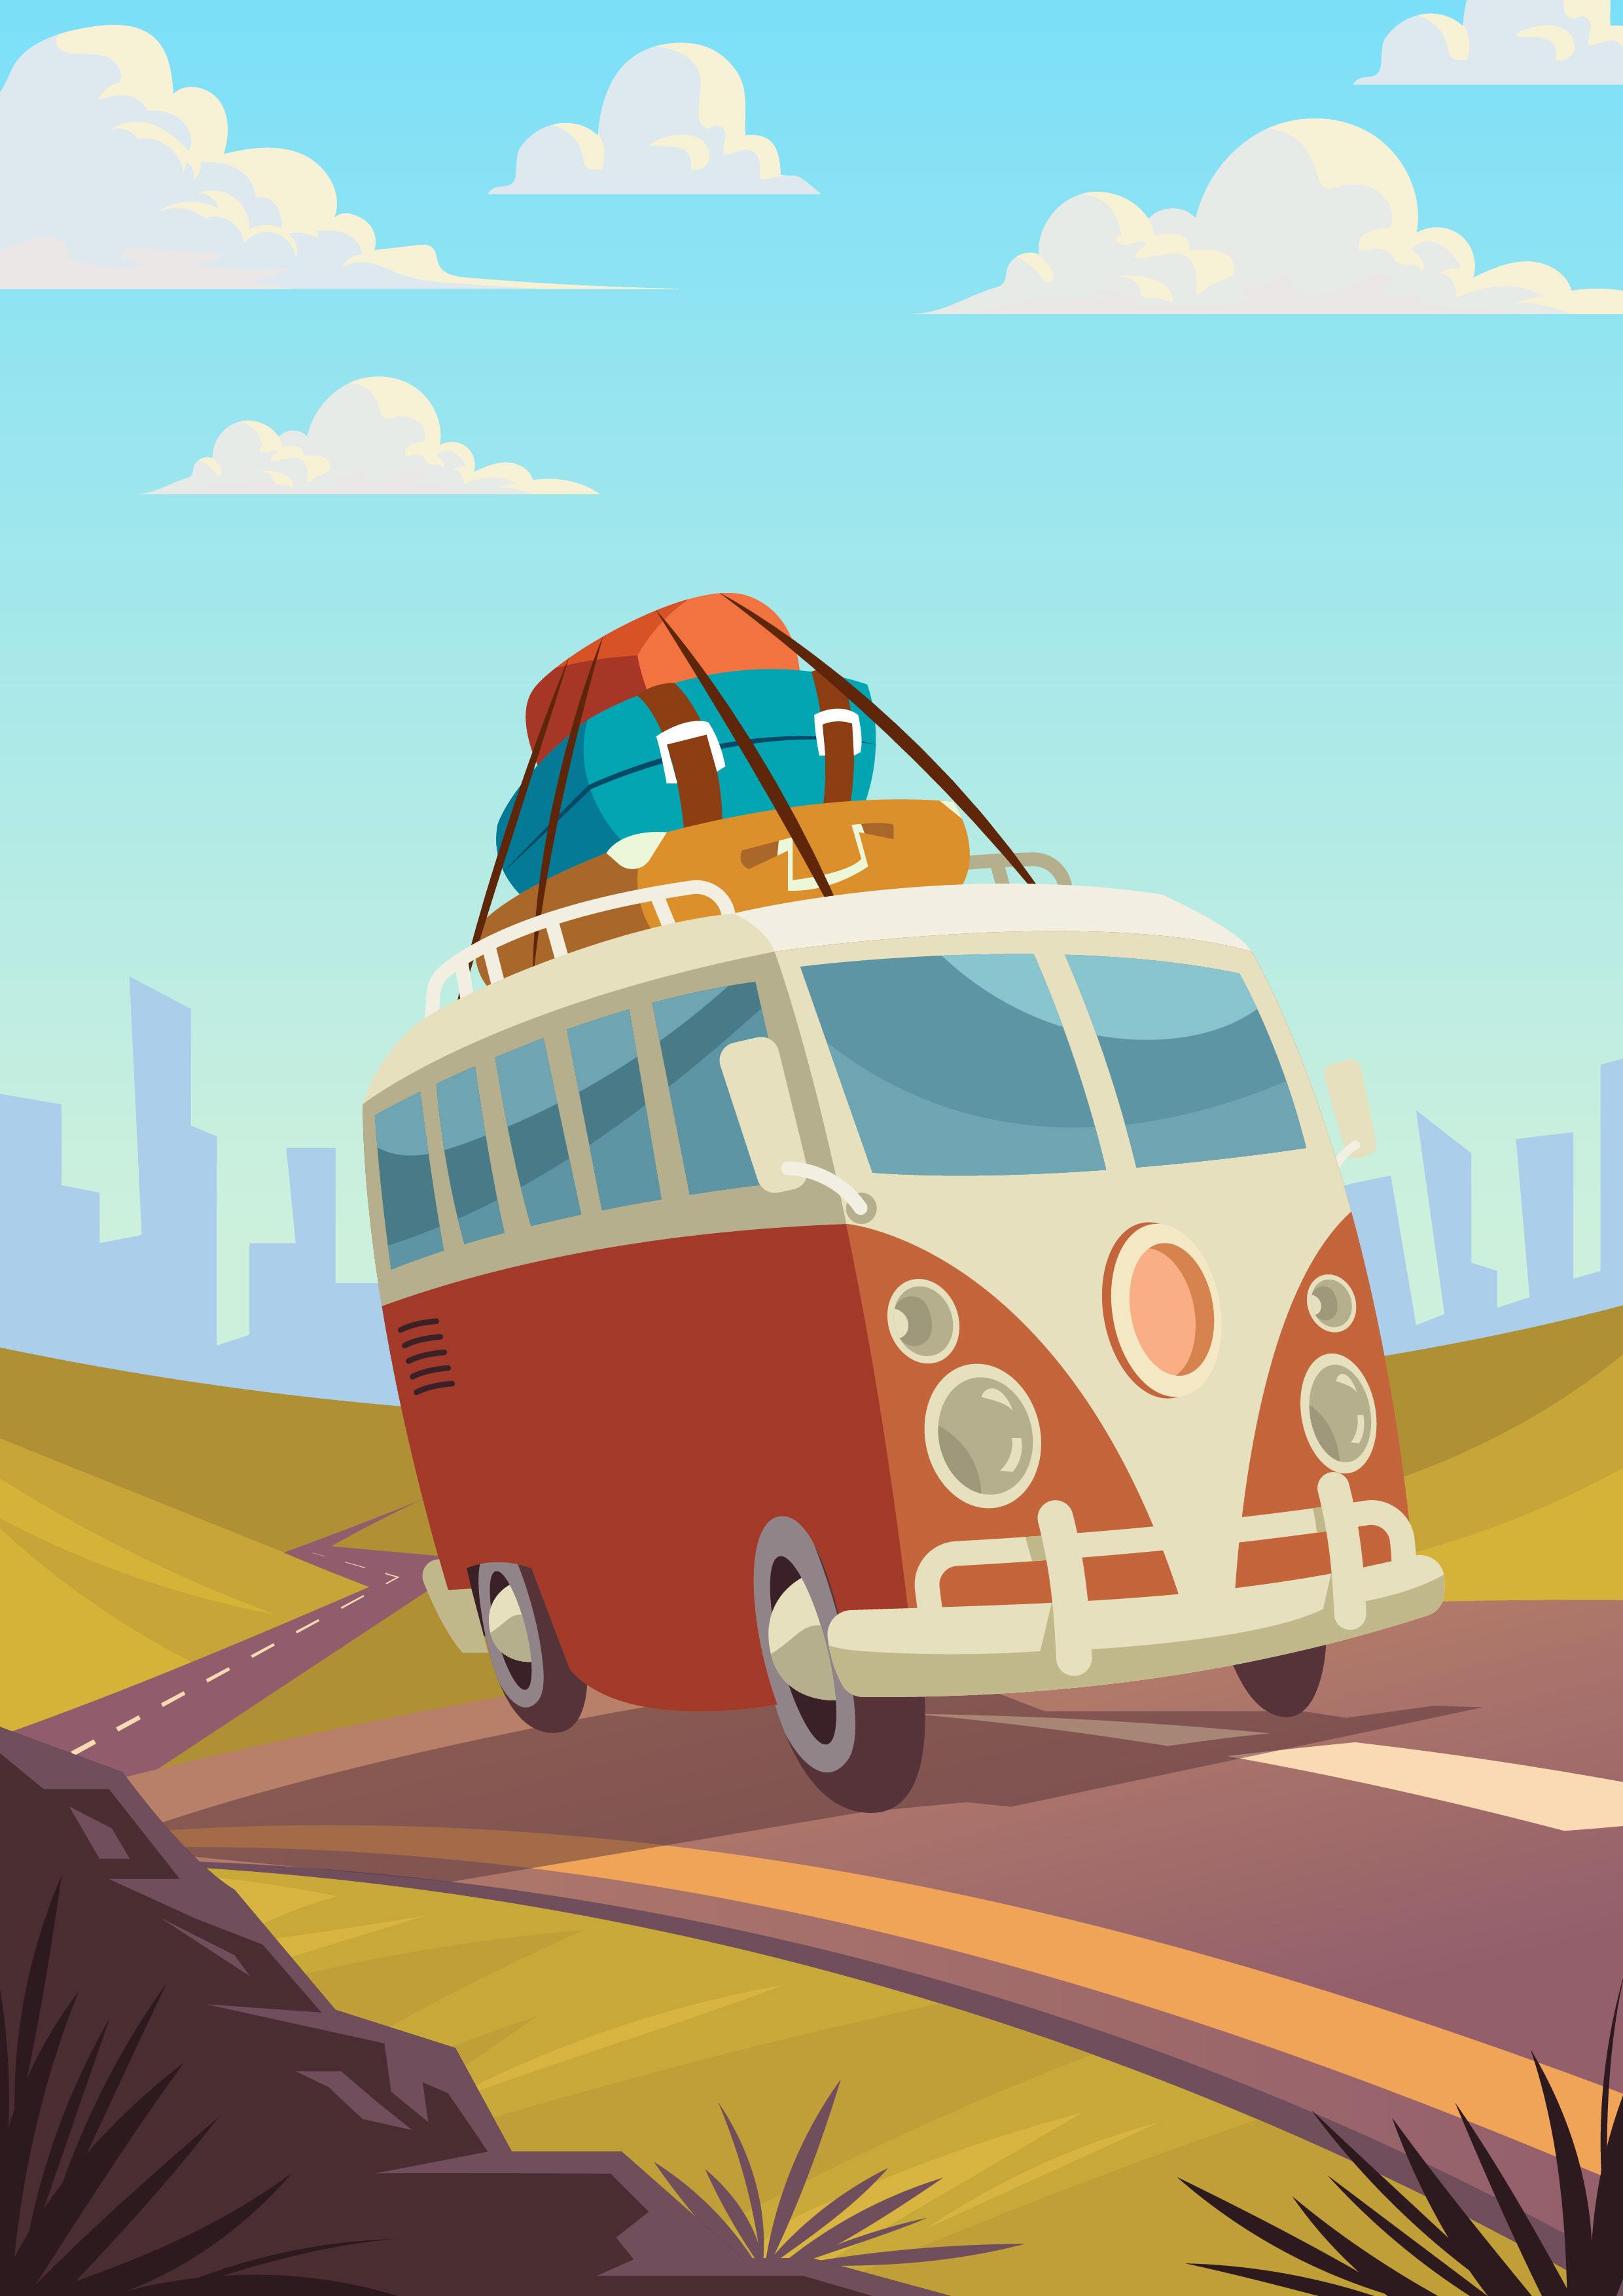 Road Trip Free Vector Art - (21,399 Free Downloads)